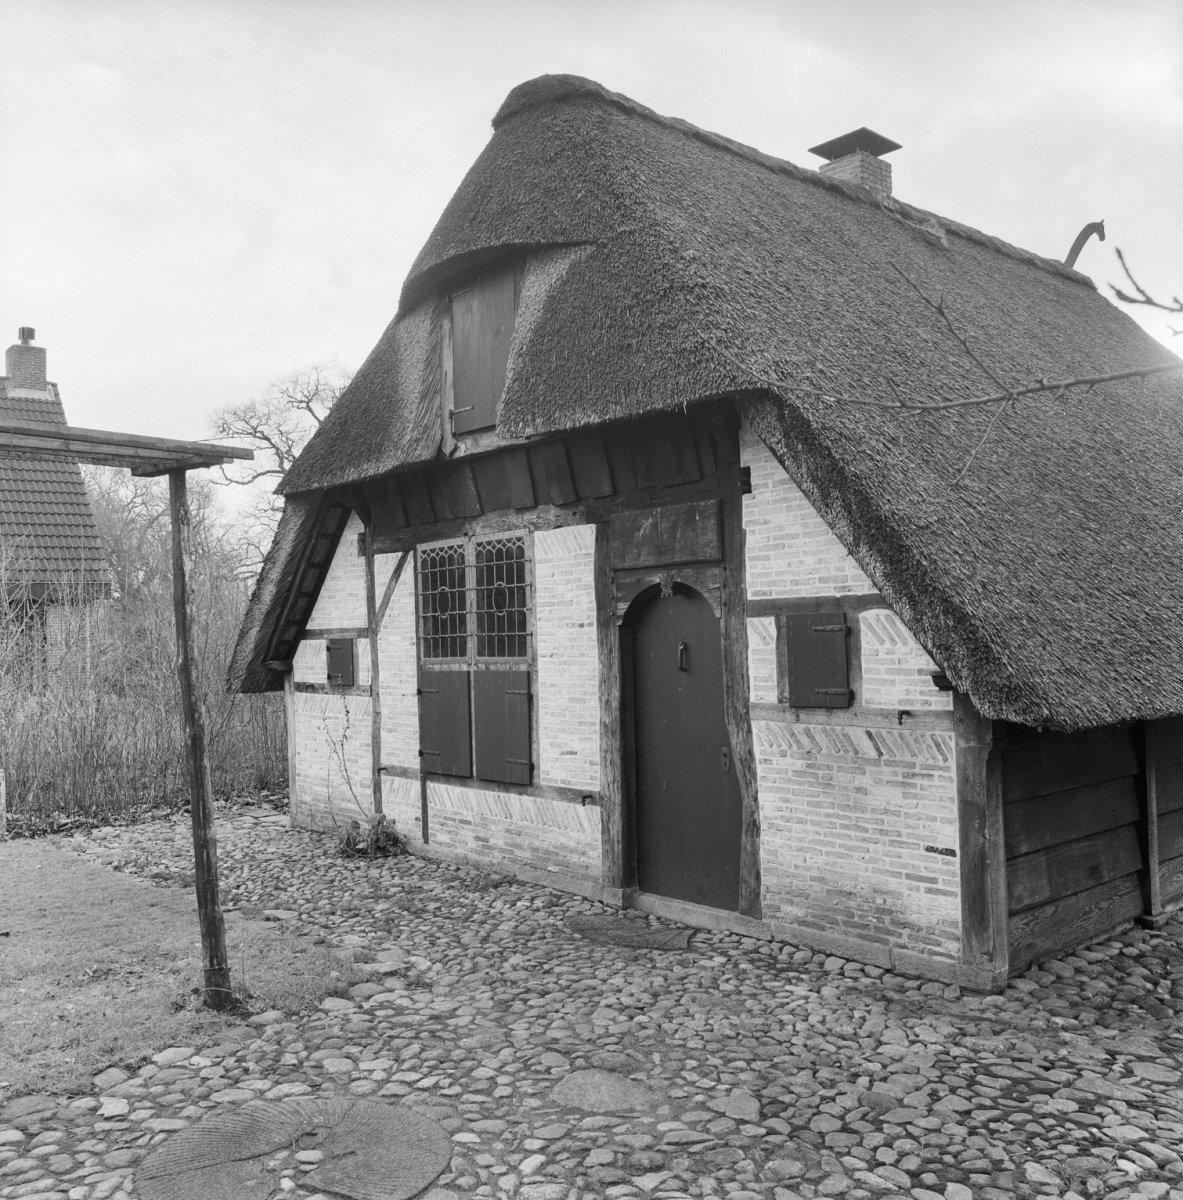 File exterieur huis bij molen vledder 20291694 wikimedia commons - Huis exterieur ...